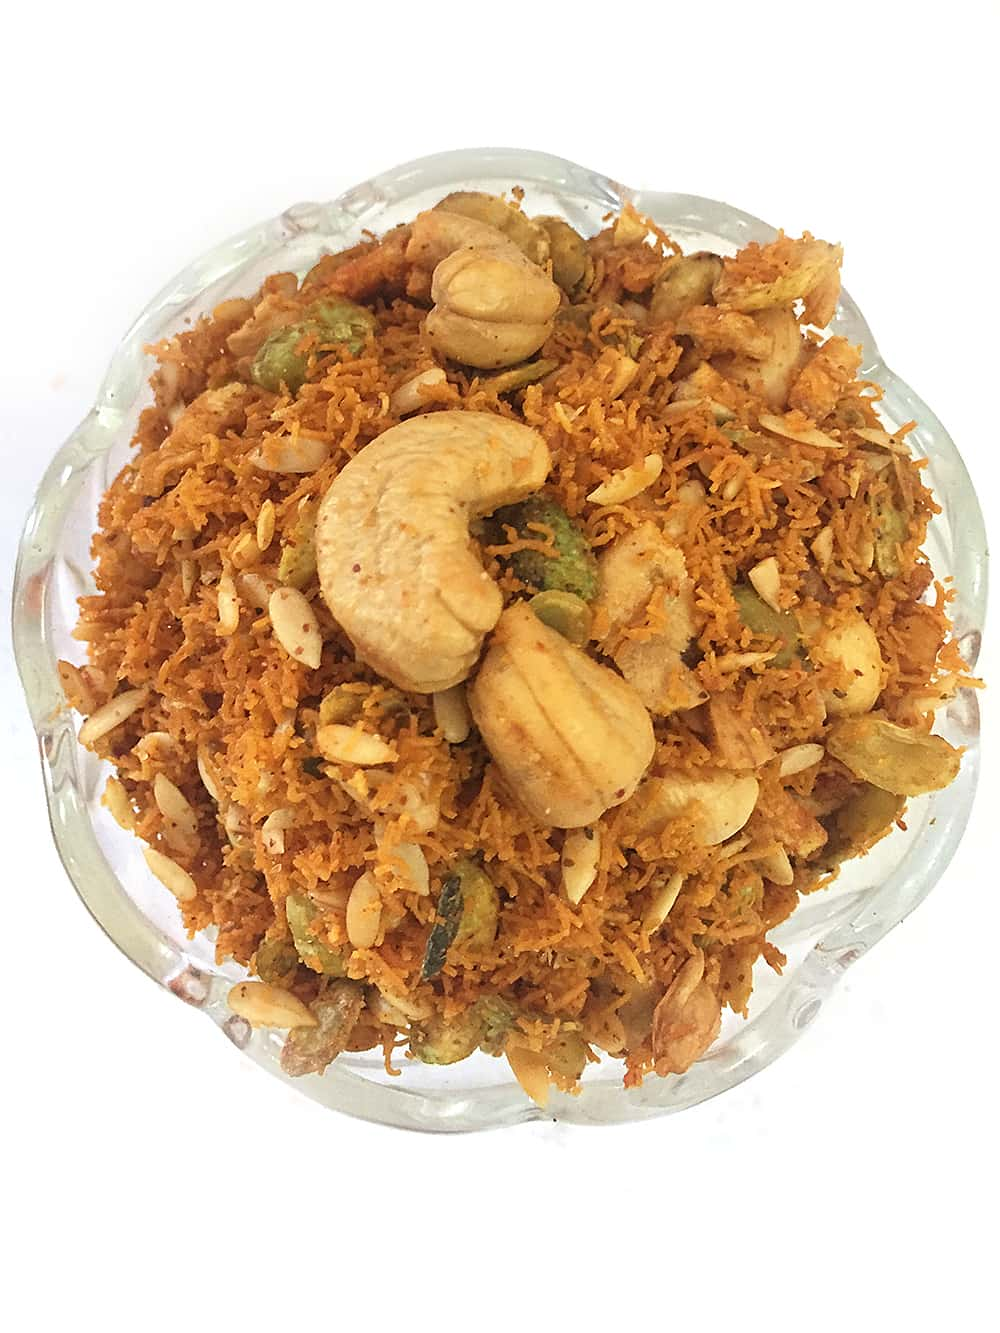 Mewa Mixture (Kanwarji's, Chandni Chowk)